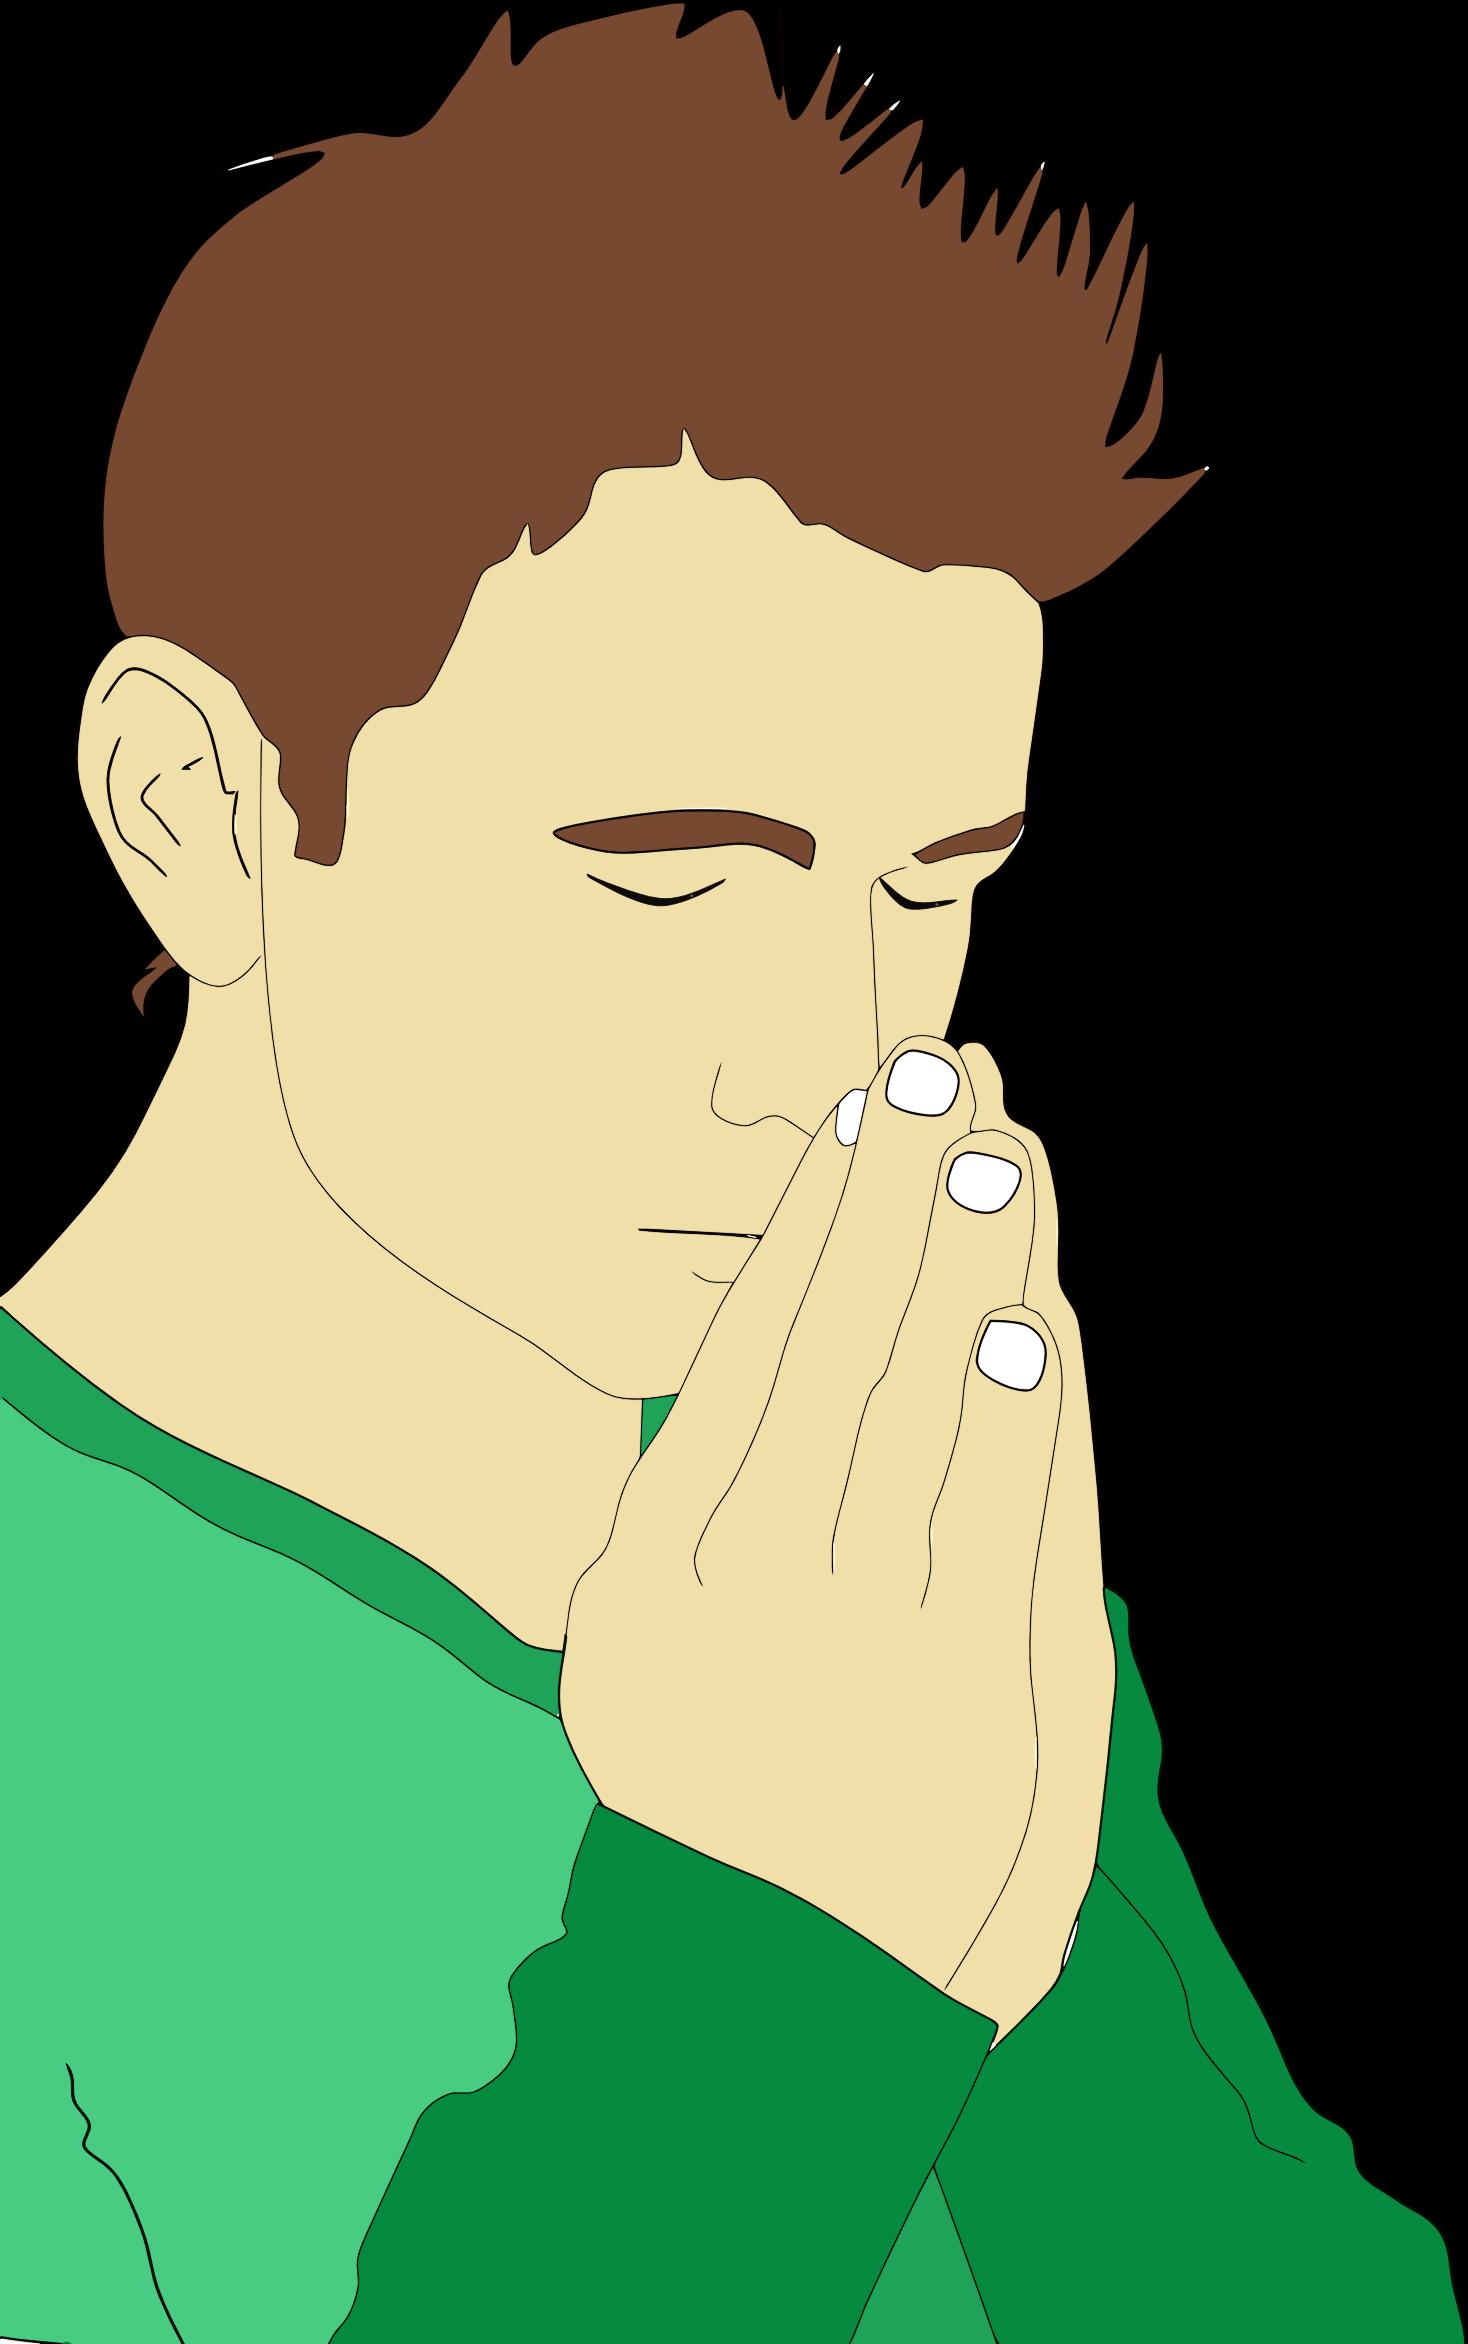 Praying man portrait big. Male clipart realistic person